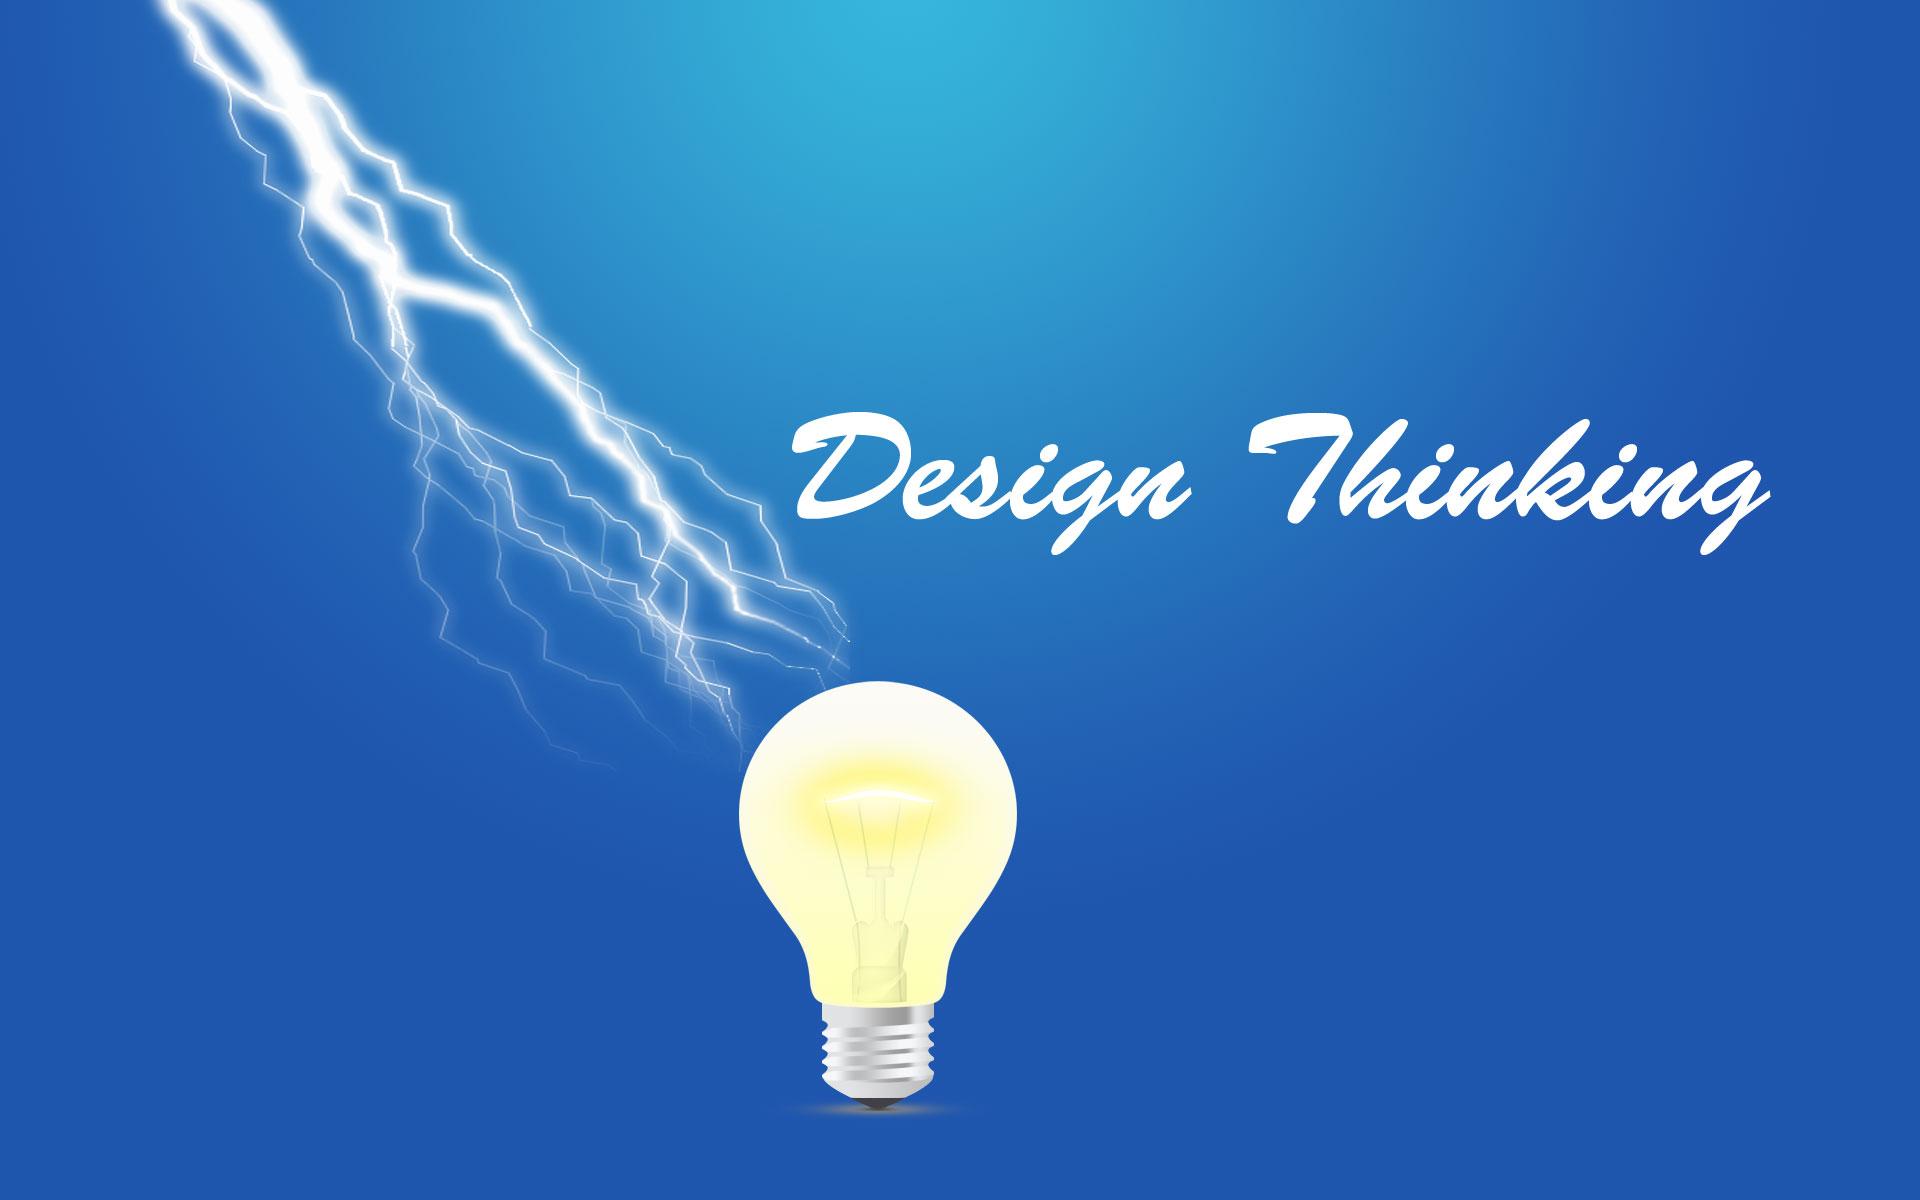 Design-Thinking-1920x1200-1